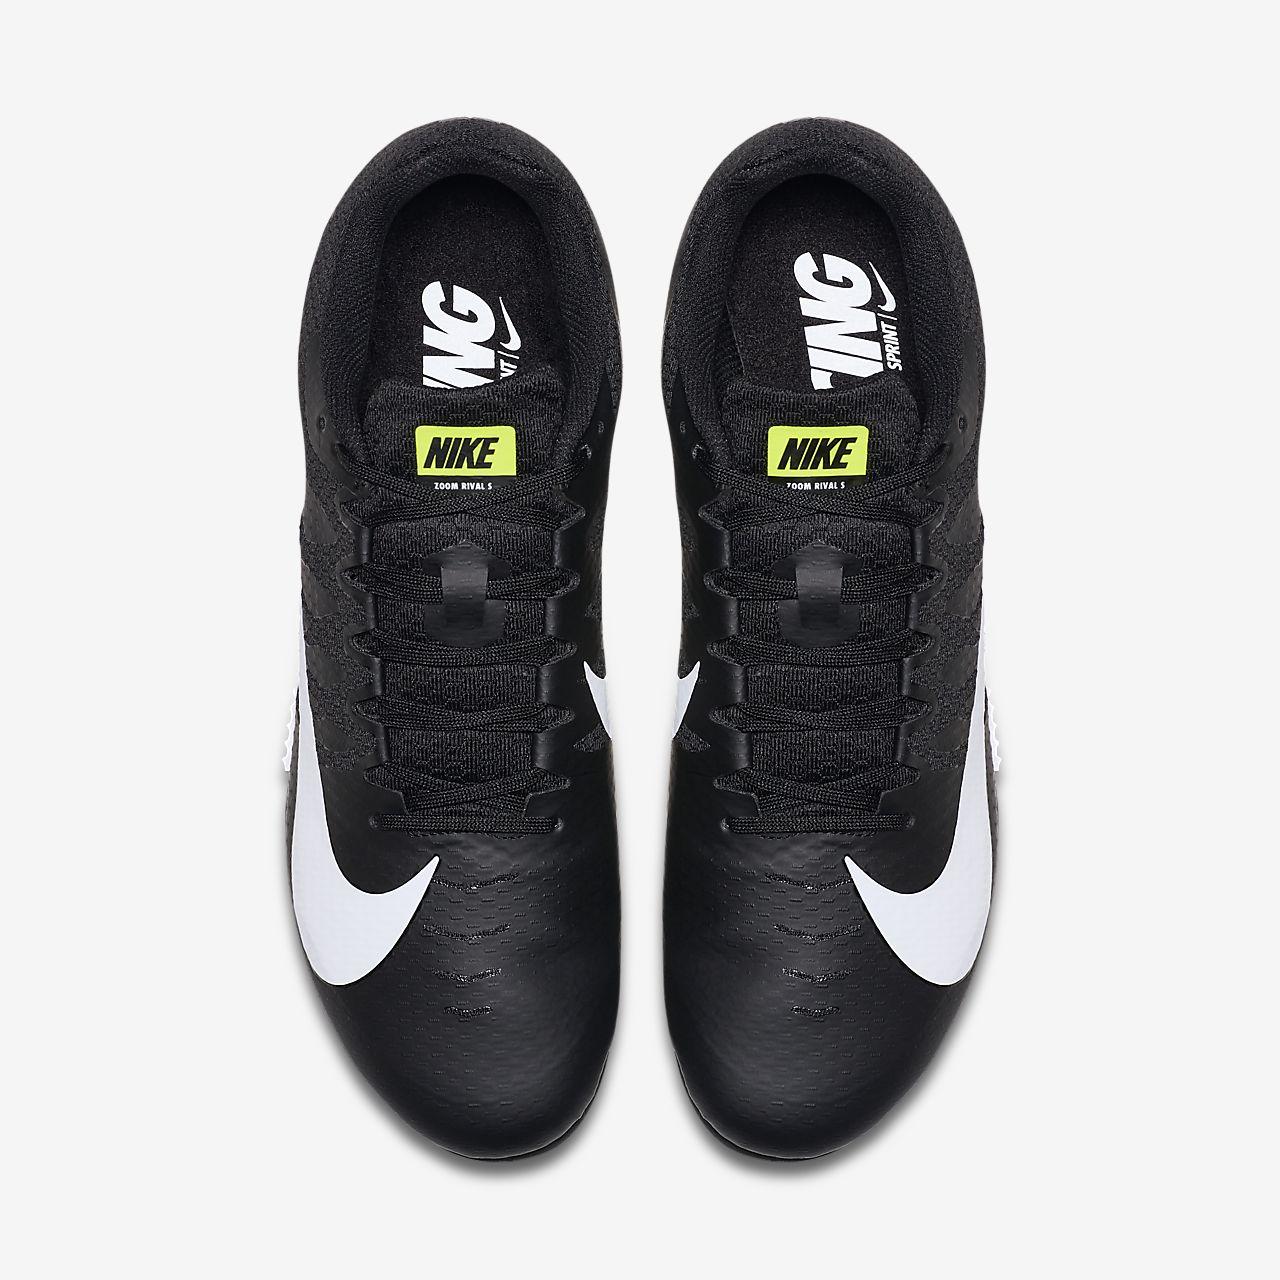 info for e26dd 85da0 ... Nike Zoom Rival S 9 Unisex Track Spike